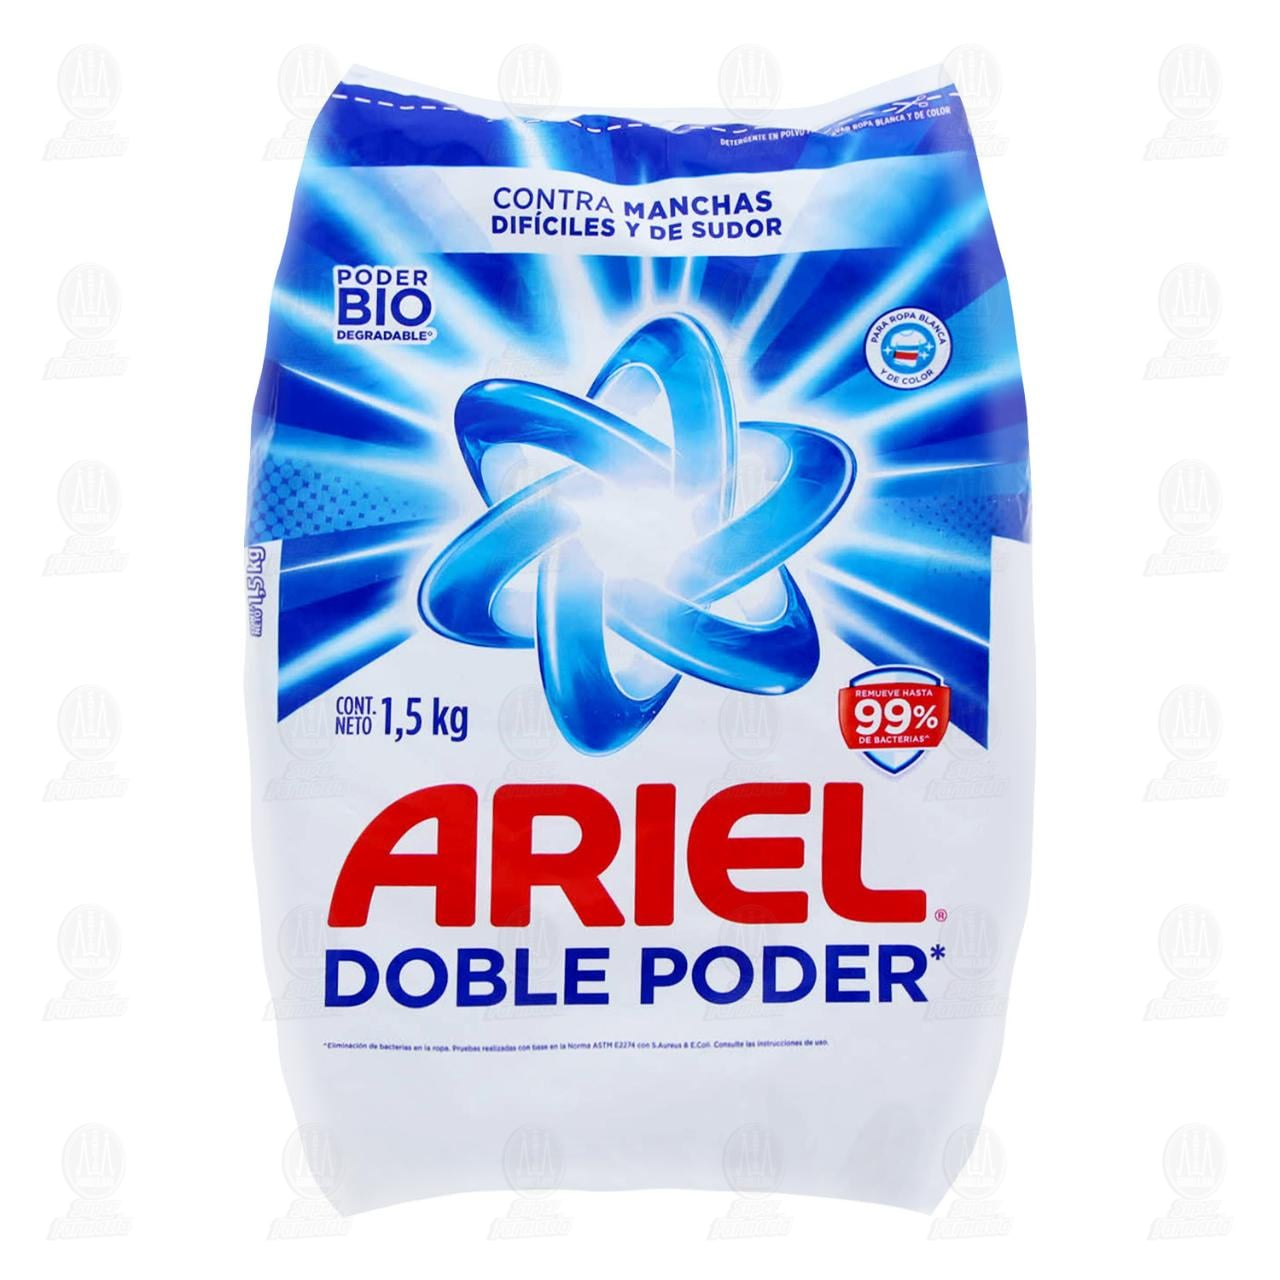 Detergente en Polvo Ariel Doble Poder 1,5 kg.